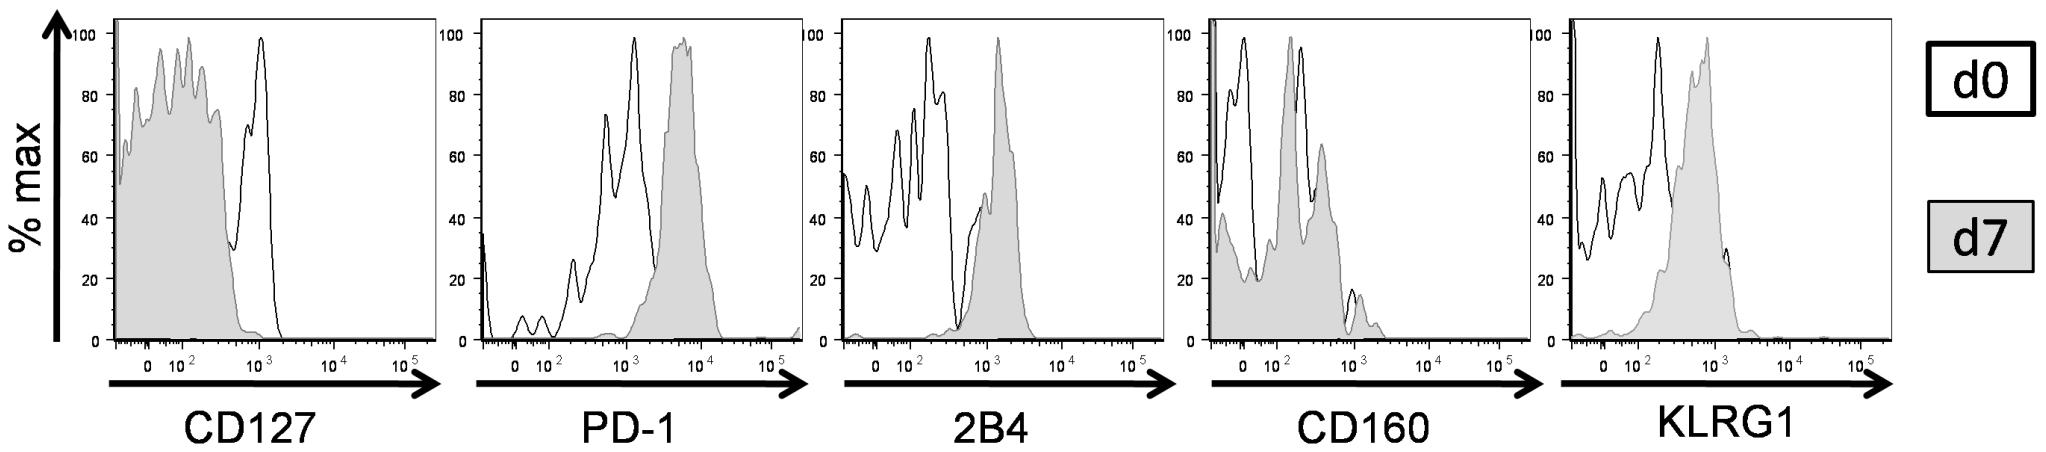 Upregulation of inhibitory receptor expression on CD127hi cells upon antigen stimulation.